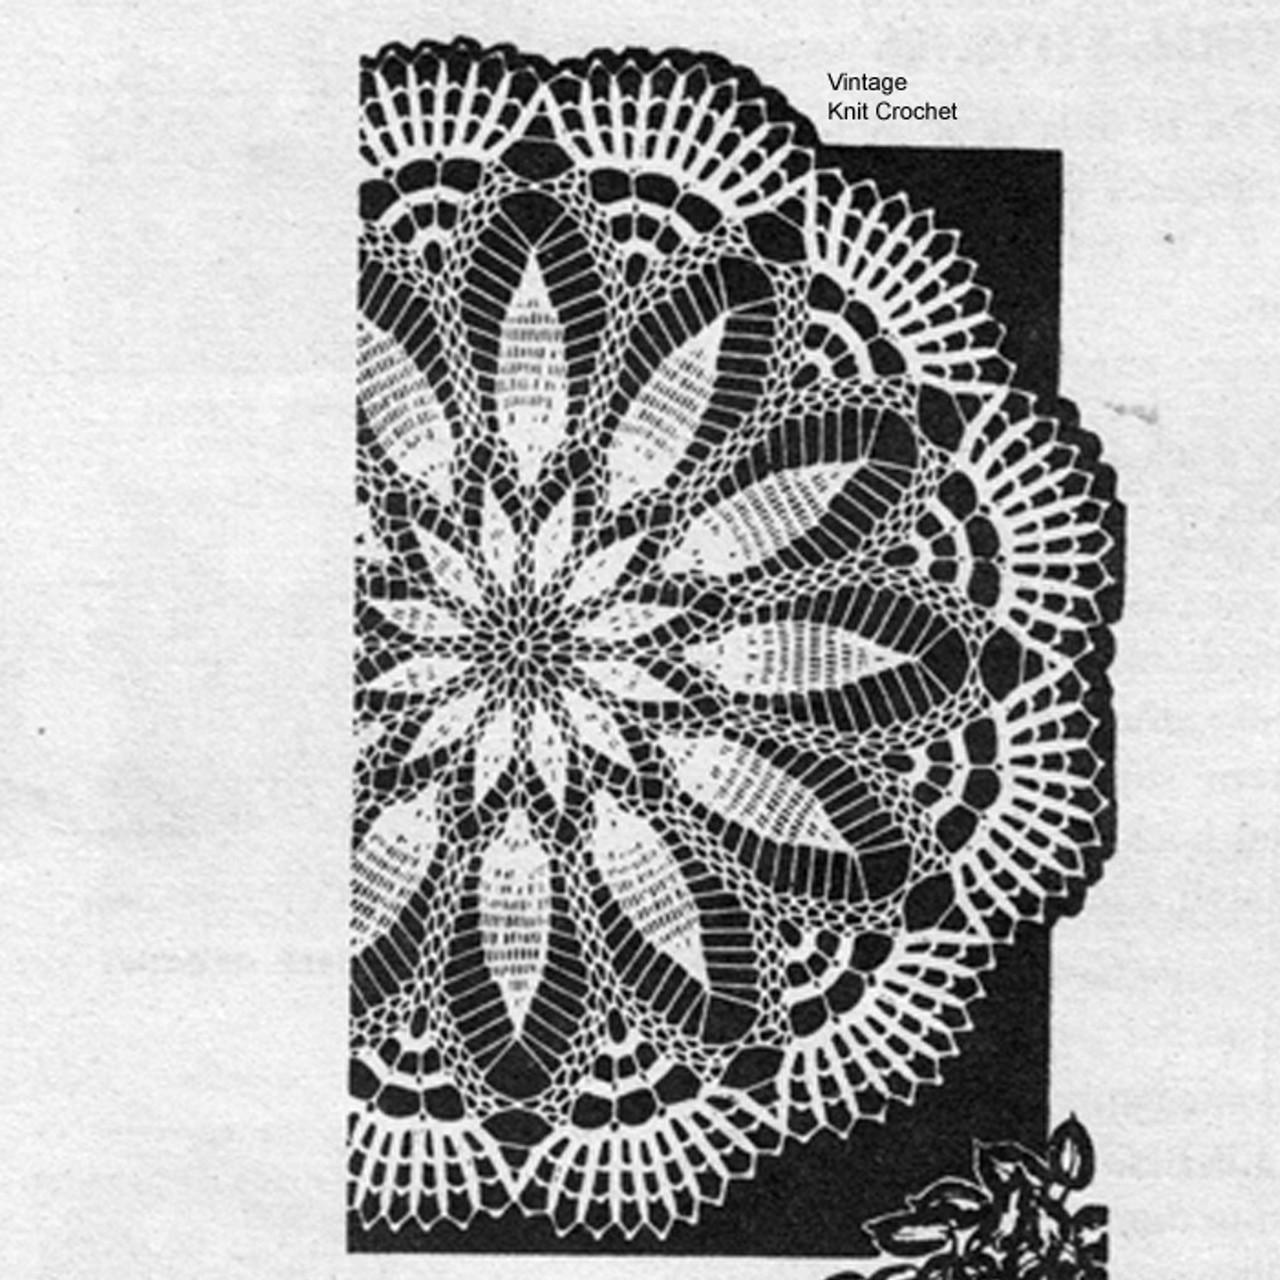 Pineapple Flower Crochet Doily pattern No 7225